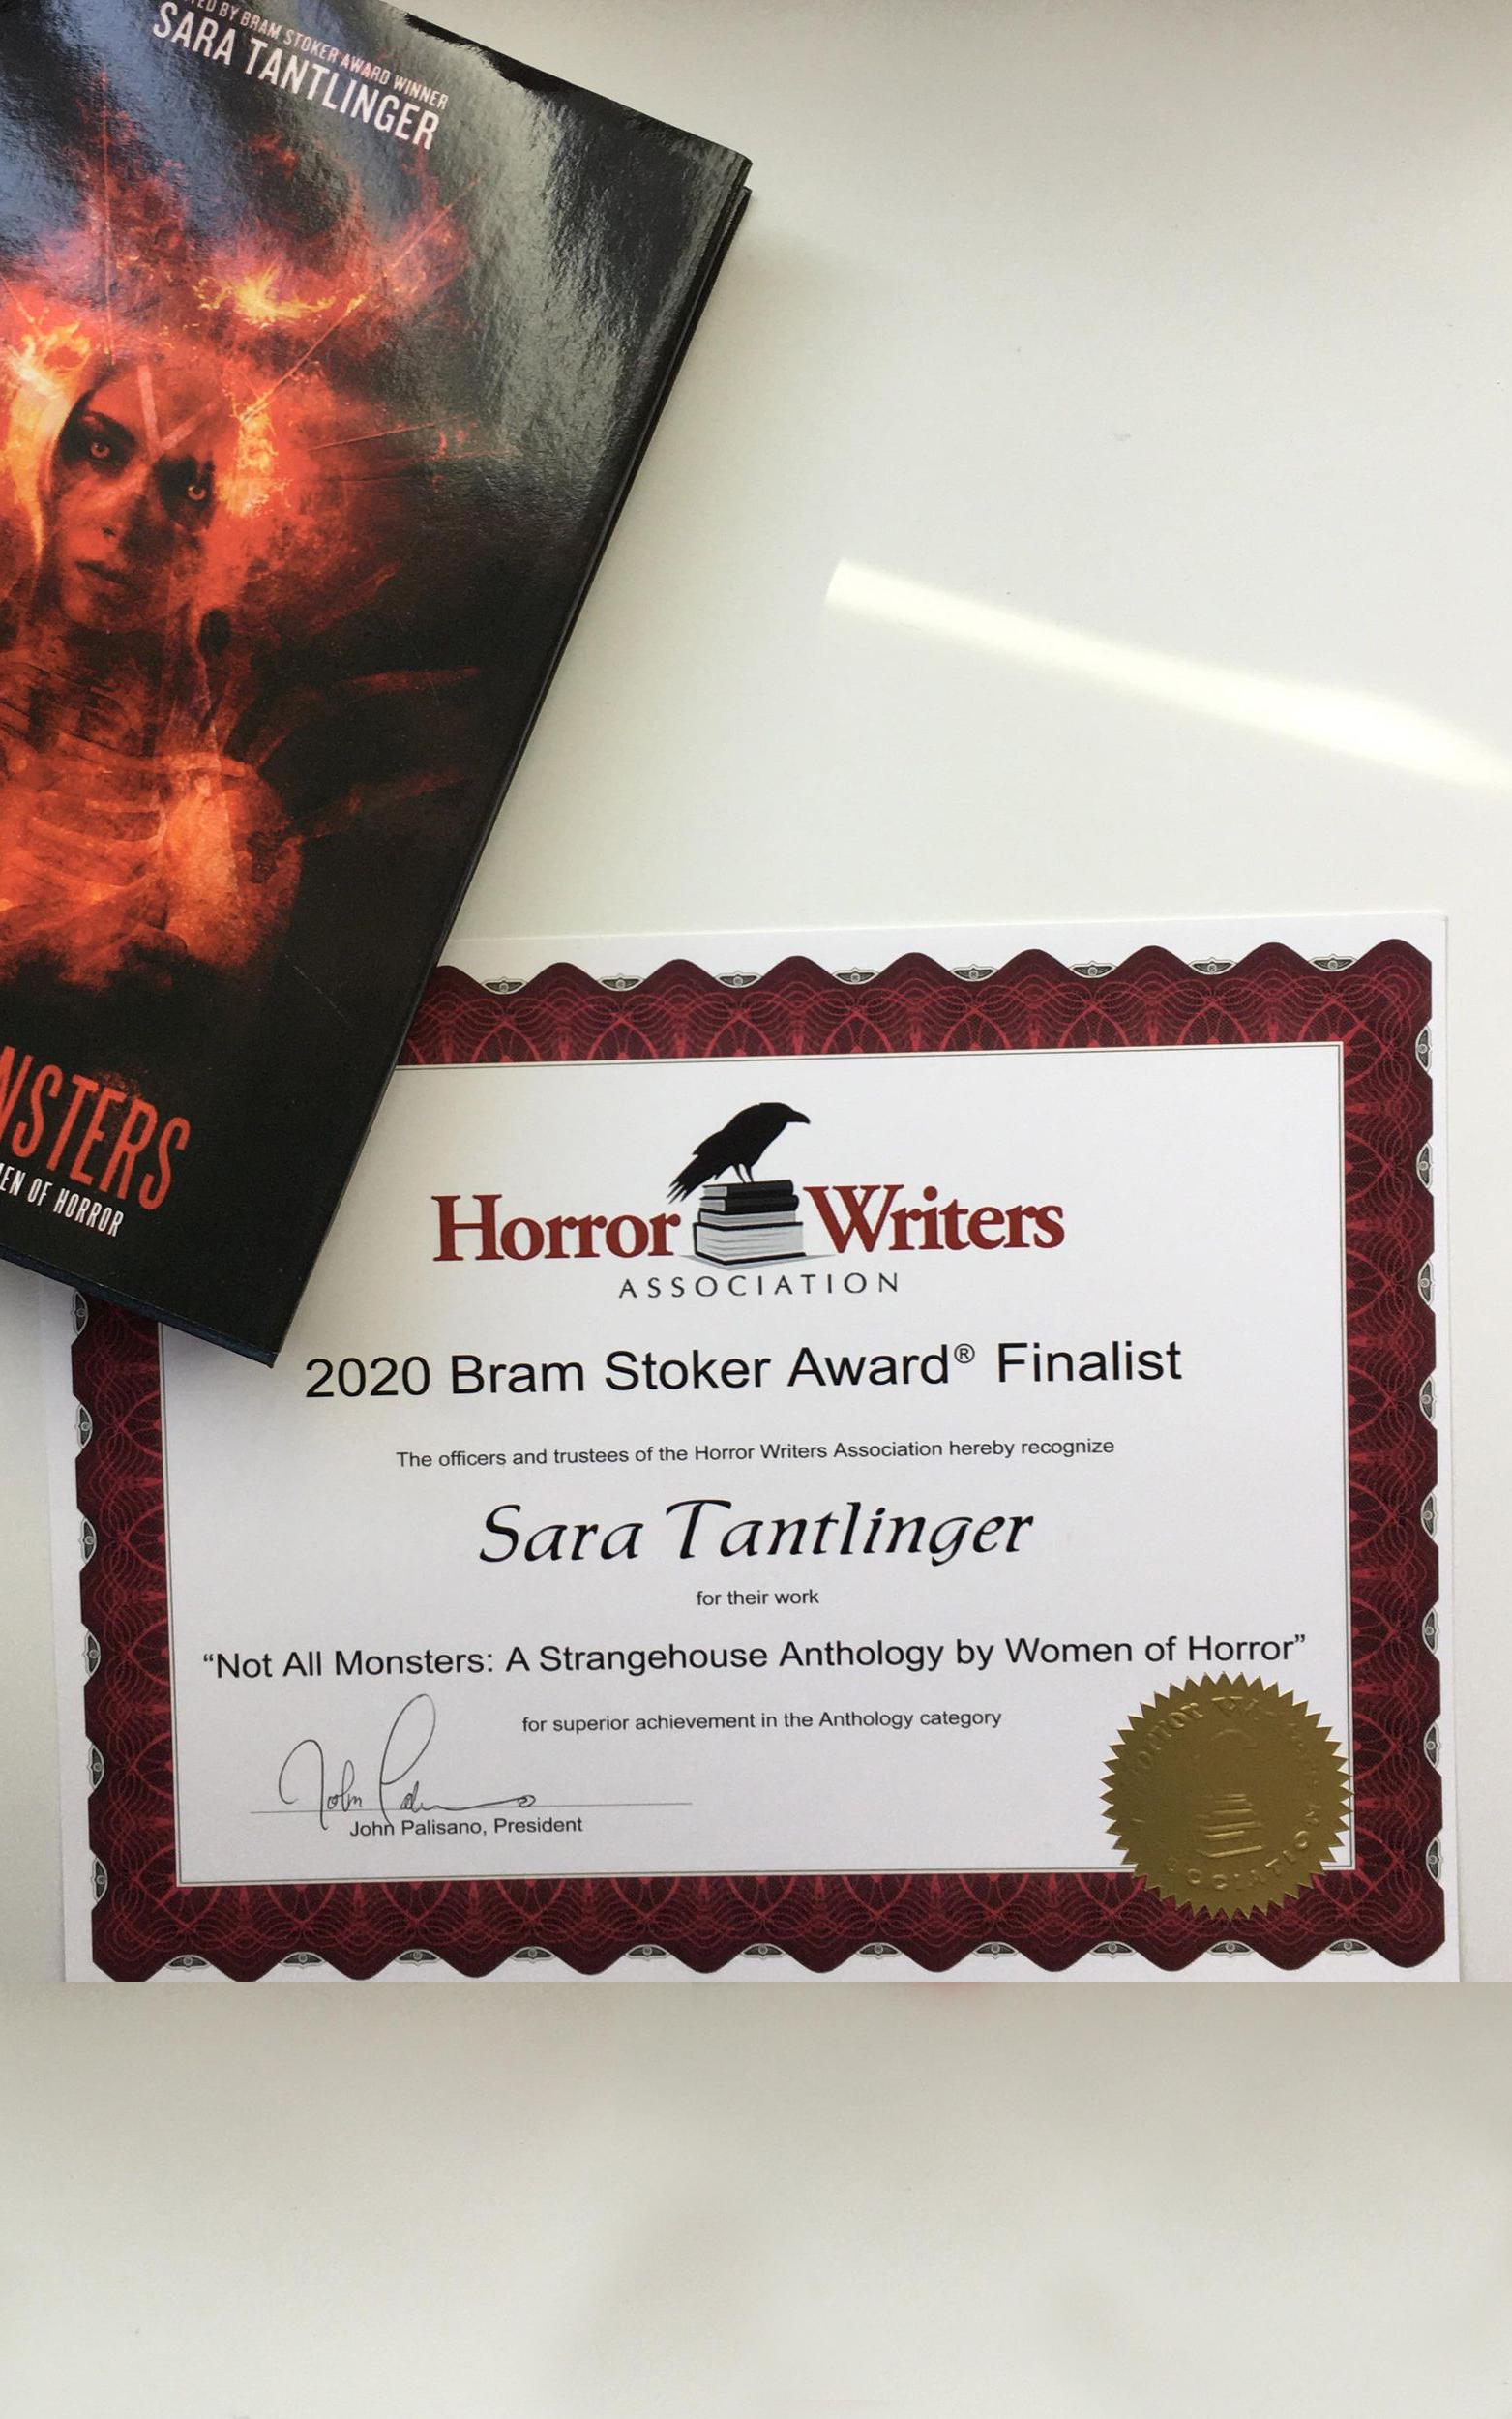 Stoker Award Finalist NOT ALL MONSTERS